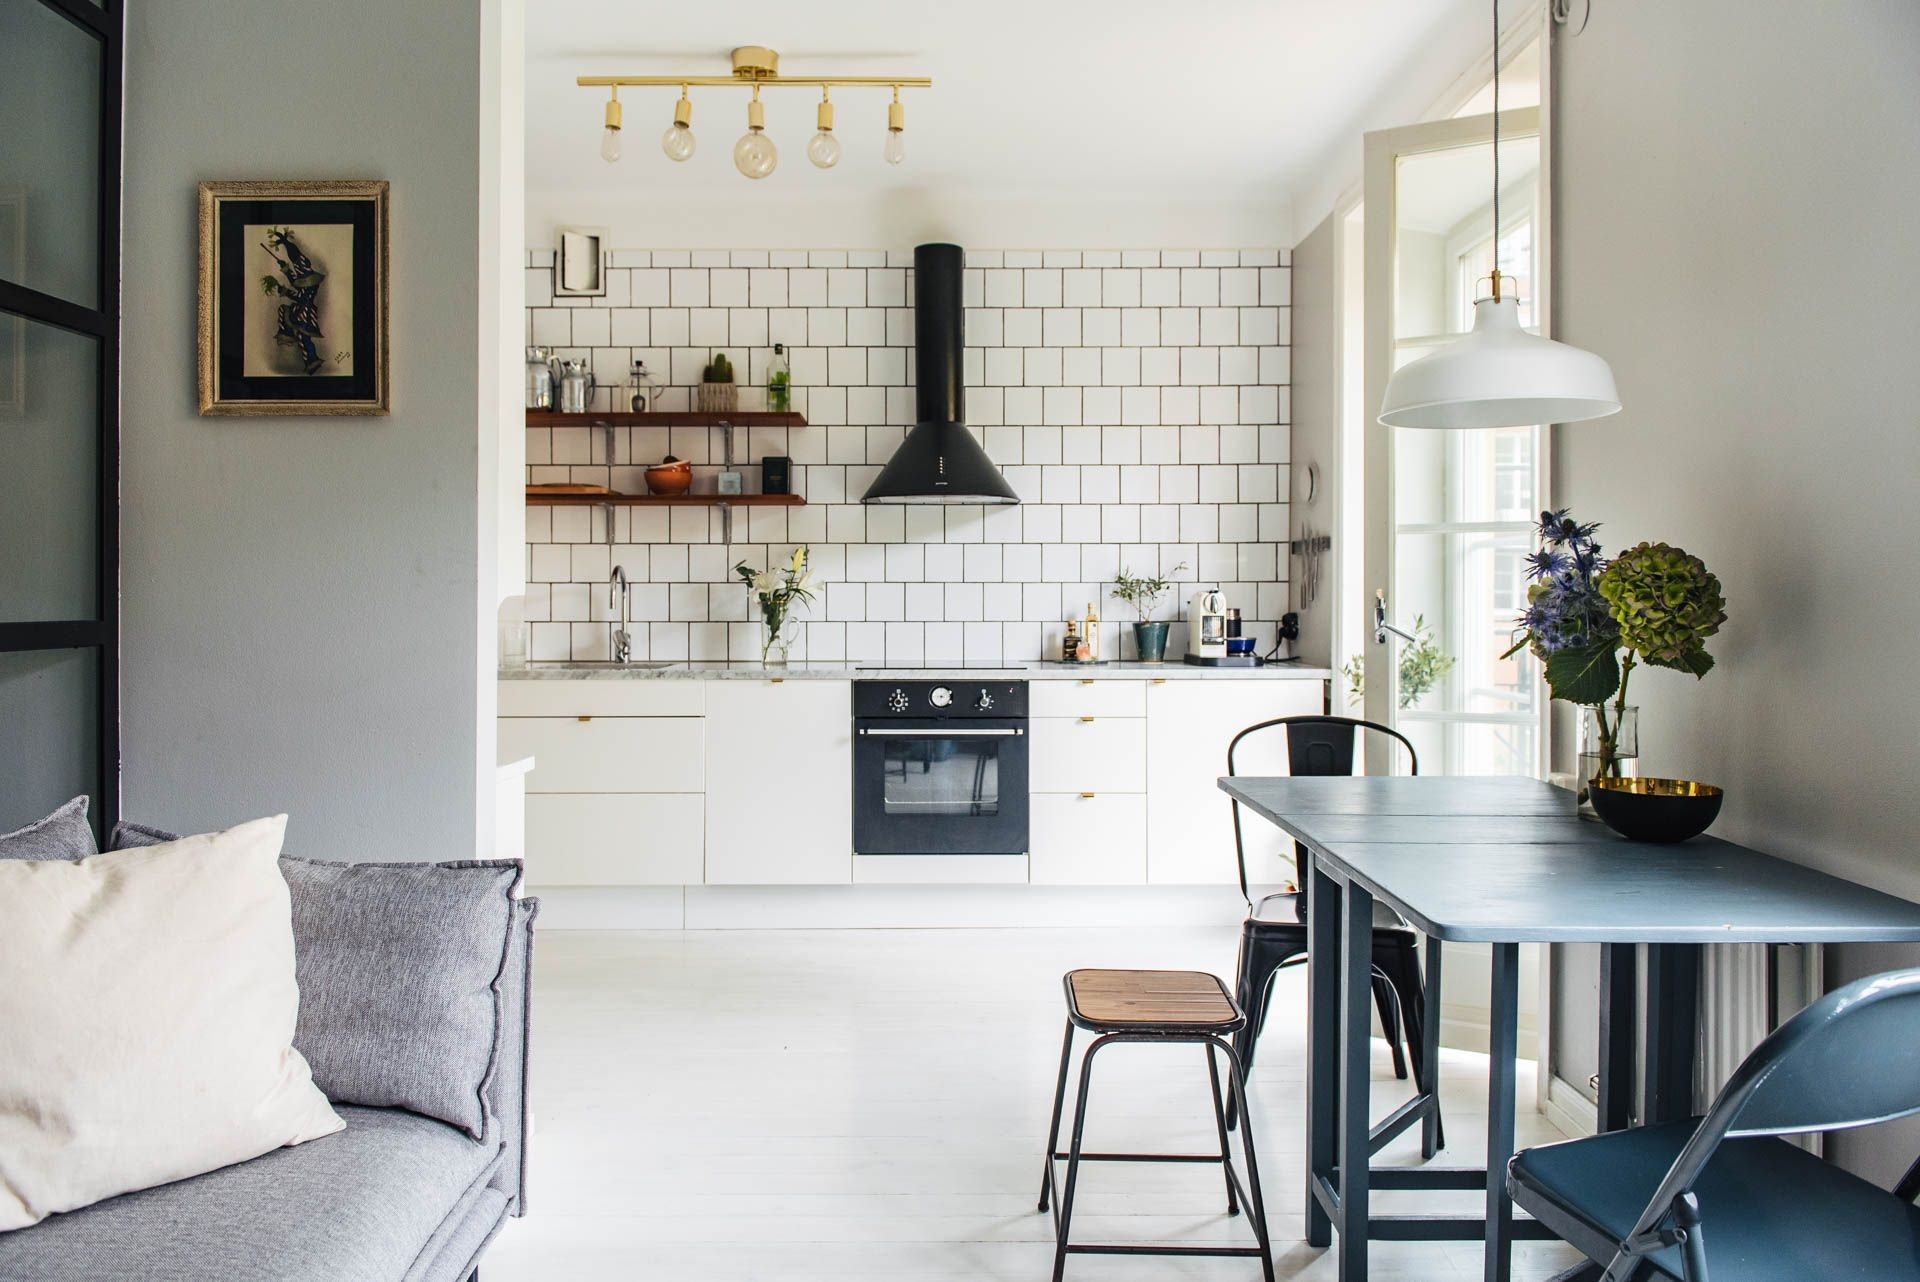 Stoere Industriele Loft : Stoere mini loft van 38m2! interieur pinterest keuken kleine